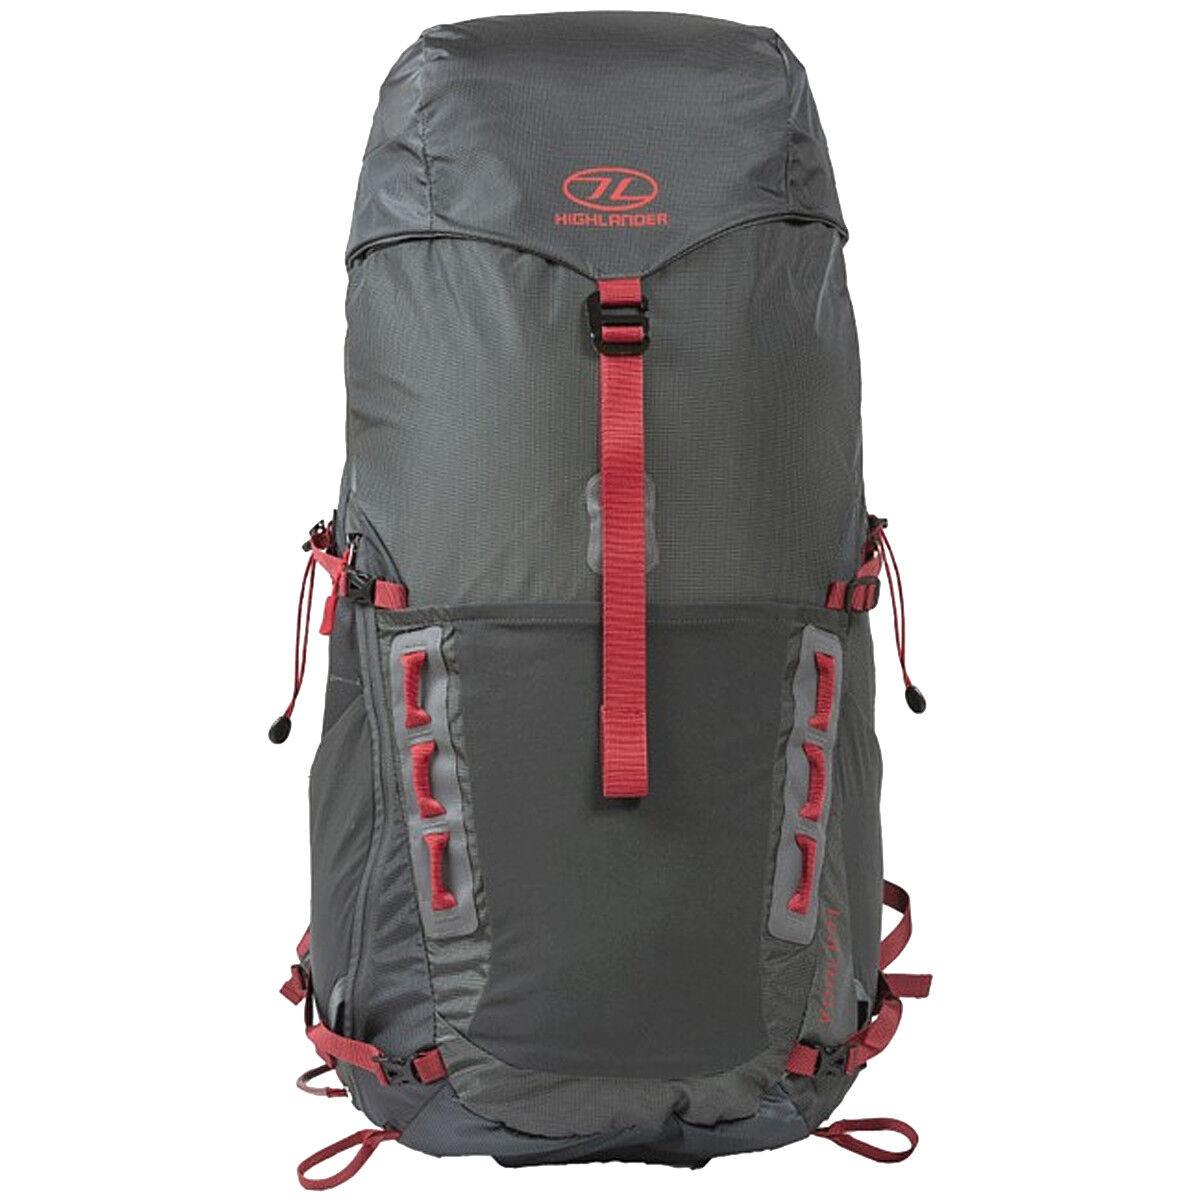 Highlander Vorlich 40 Zaino Outdoor Trekking Viaggio Viaggio Viaggio Festival Campeggio Charcoal 15dfe9